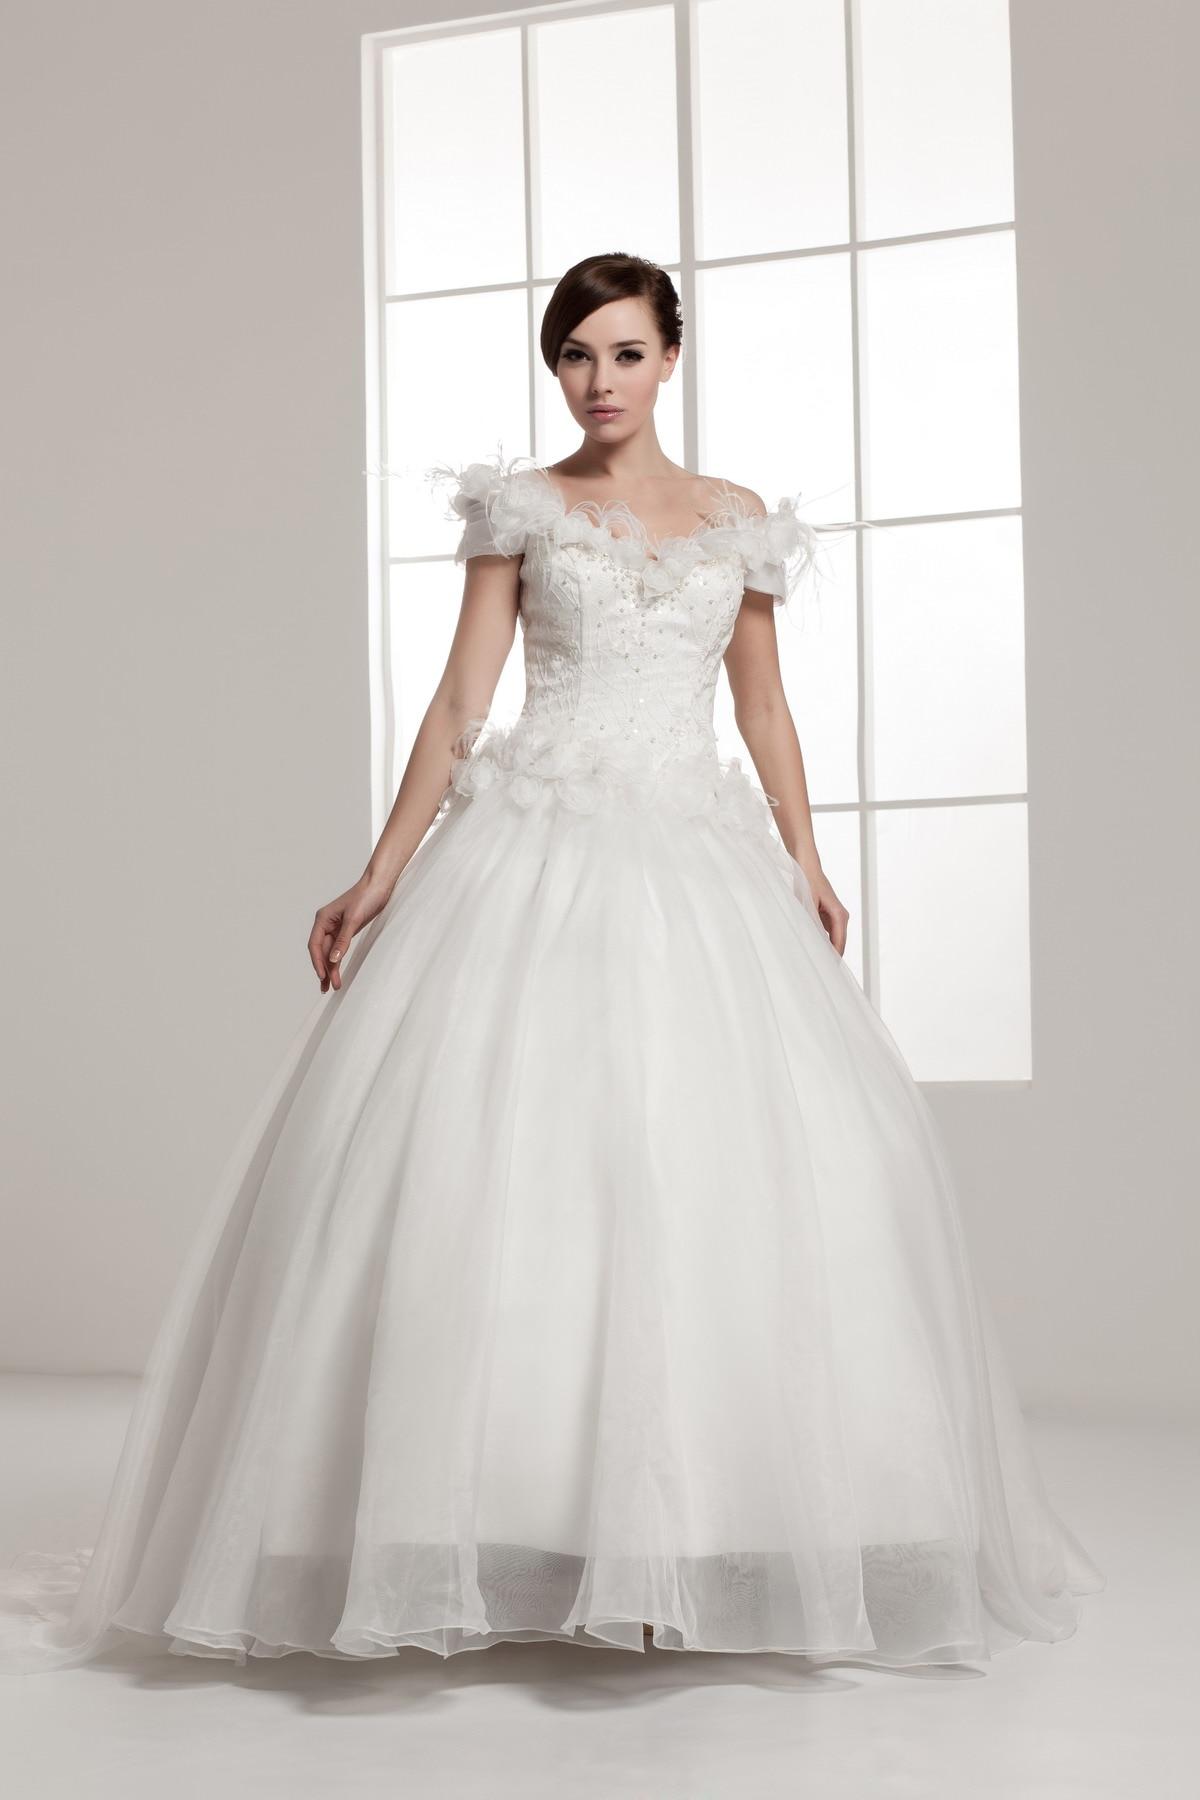 disney princess fairytale wedding dresses fairy wedding dress Wedding Dresses Disney Princess Collection 4